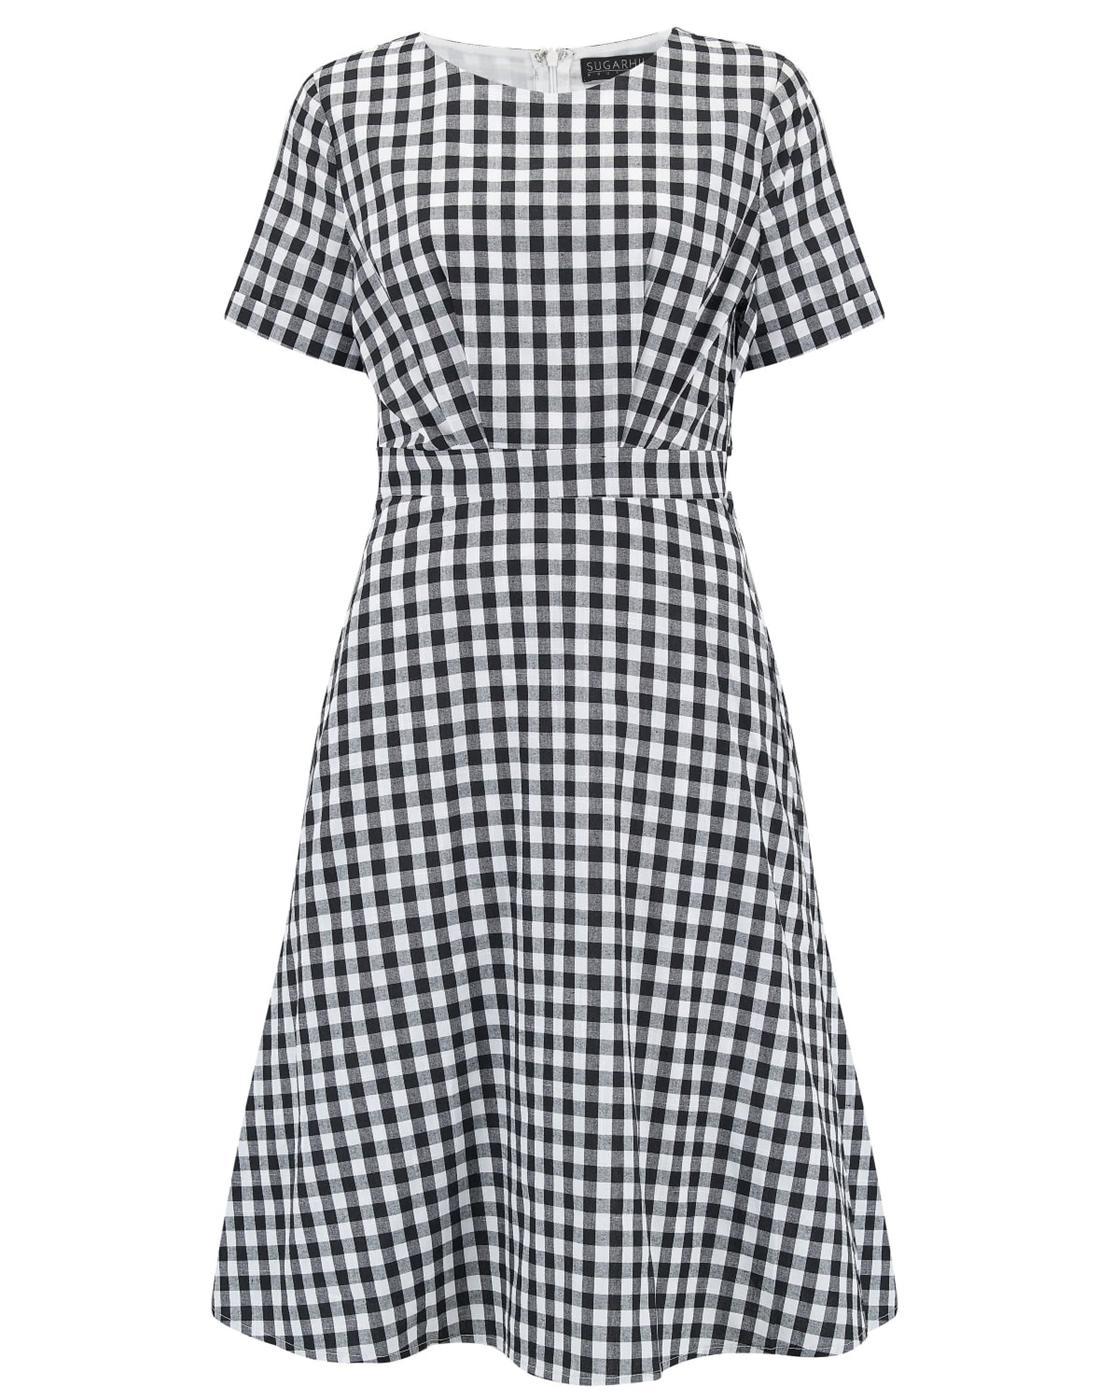 Jaya SUGARHILL BOUTIQUE Retro Gingham Mod Dress